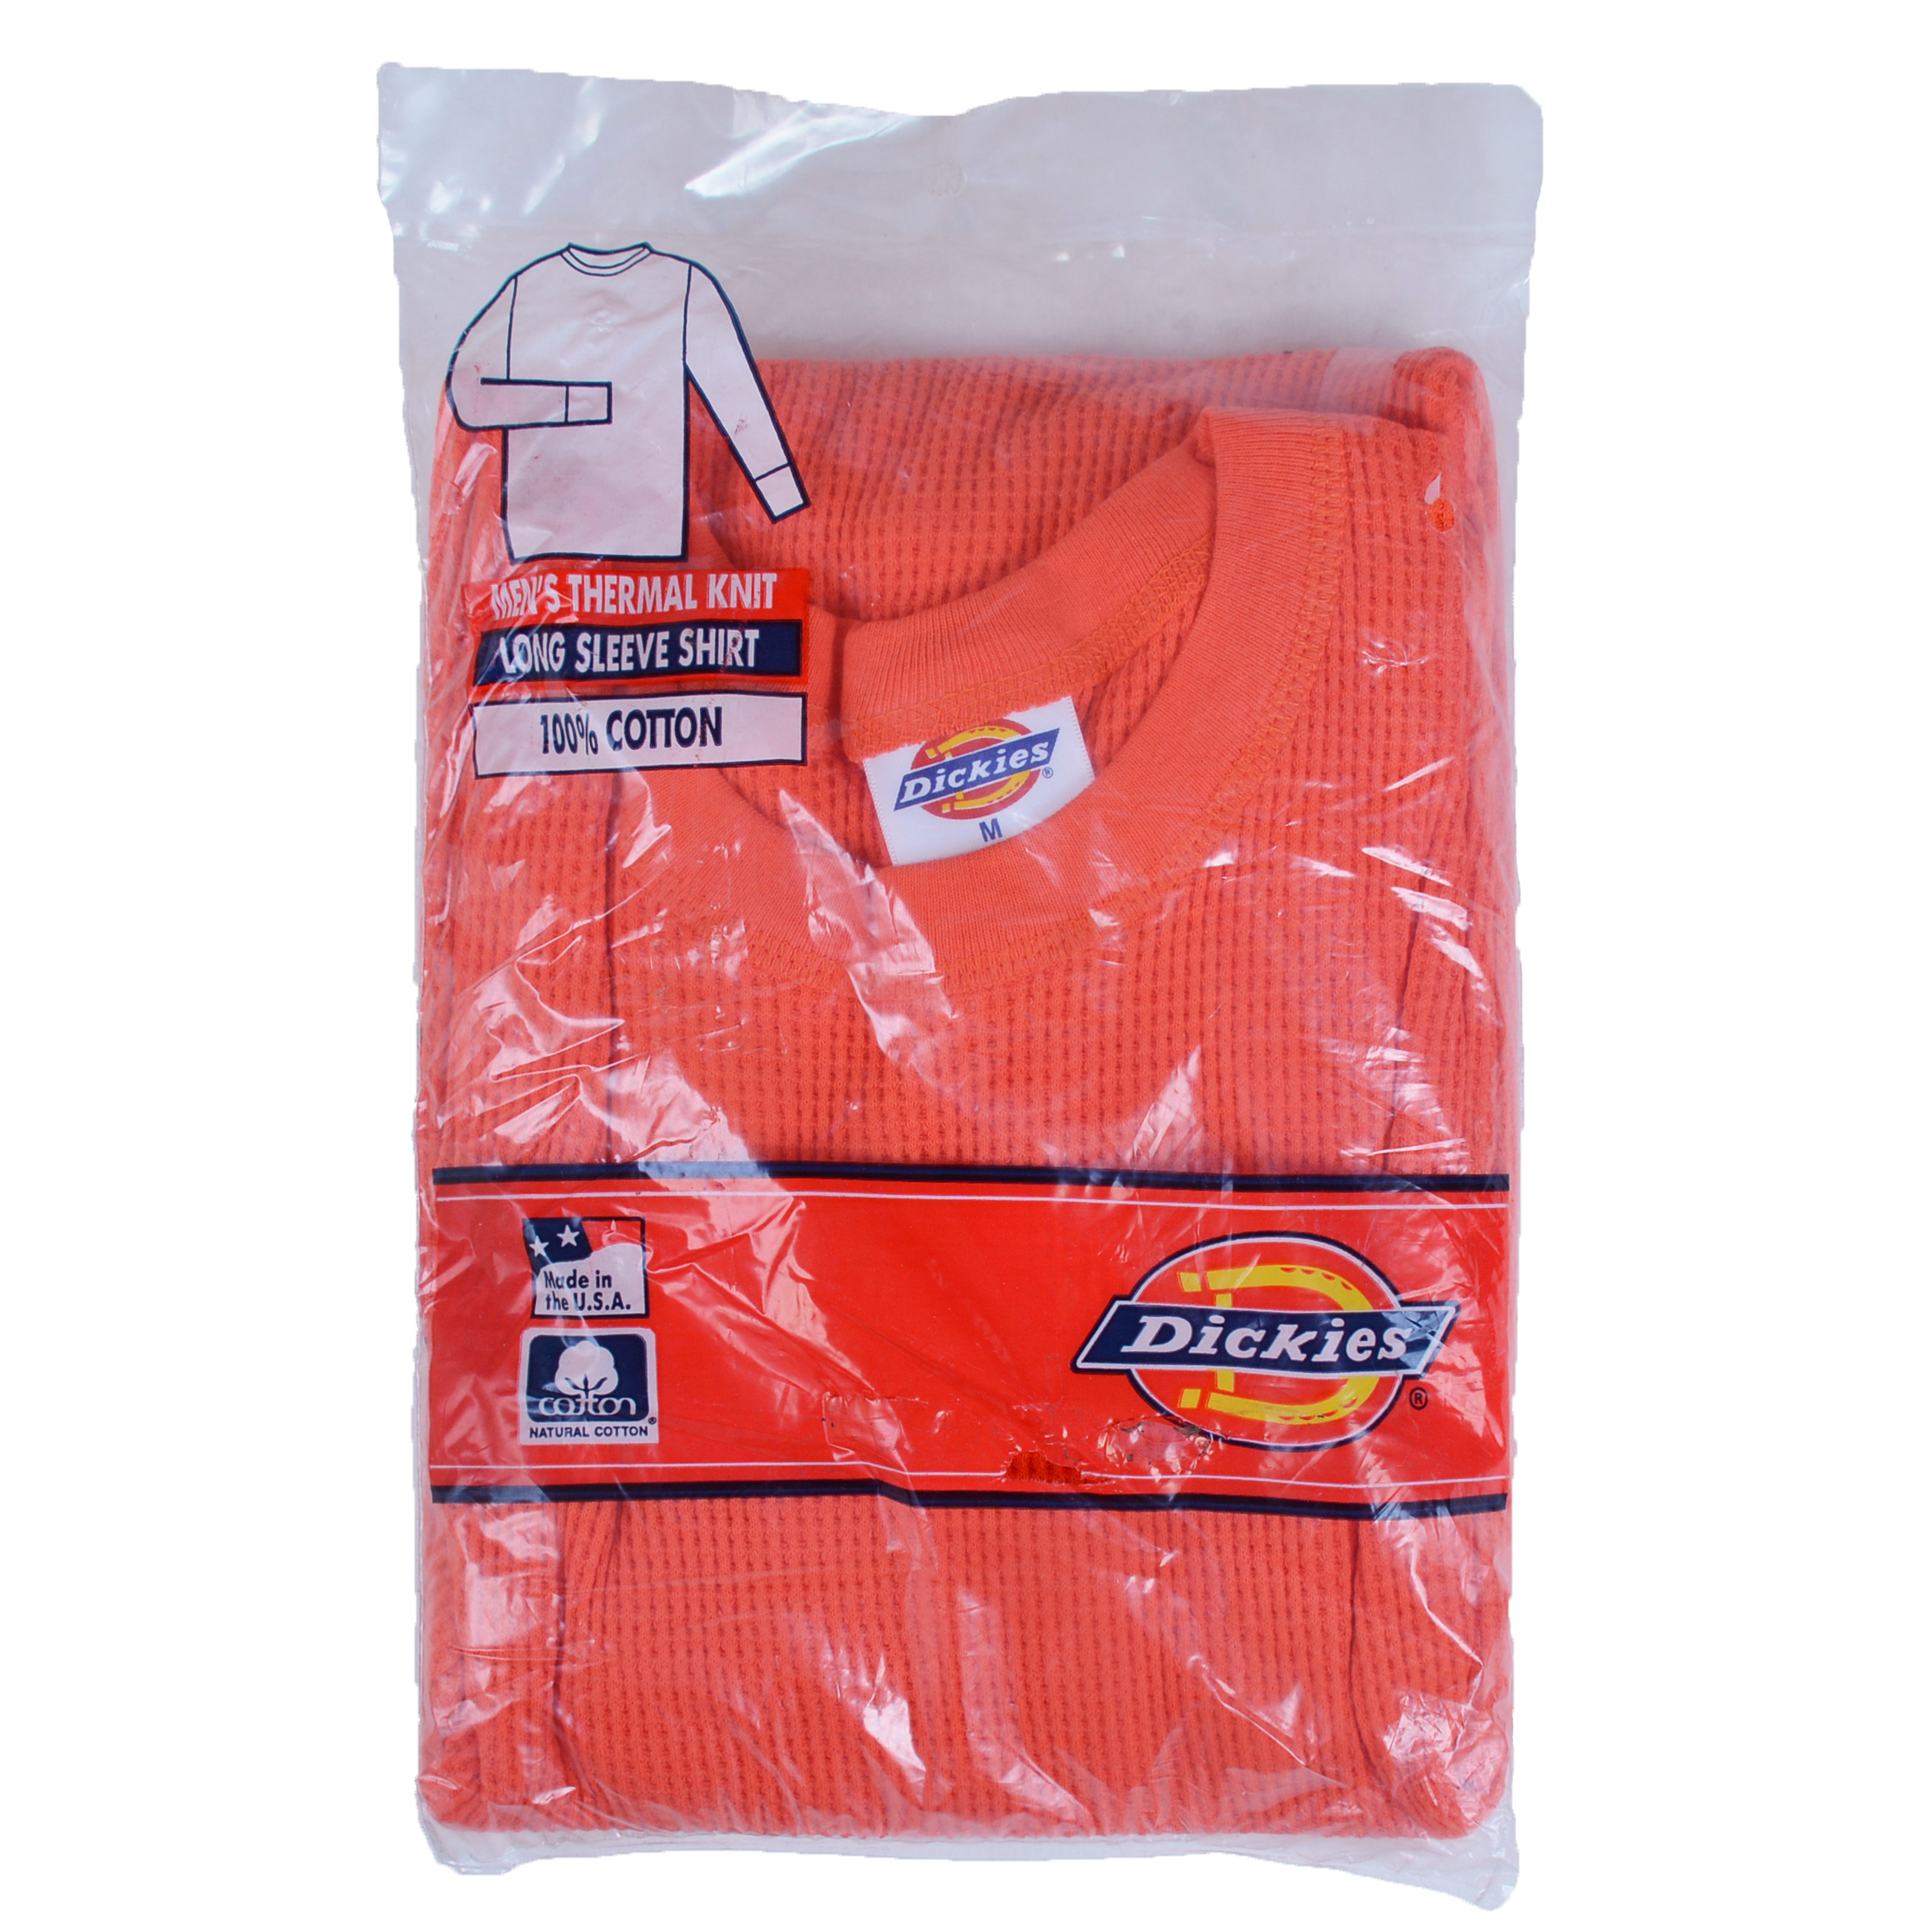 Dickies Men 39 S Thermal Knit Long Sleeve Shirt Orange 100